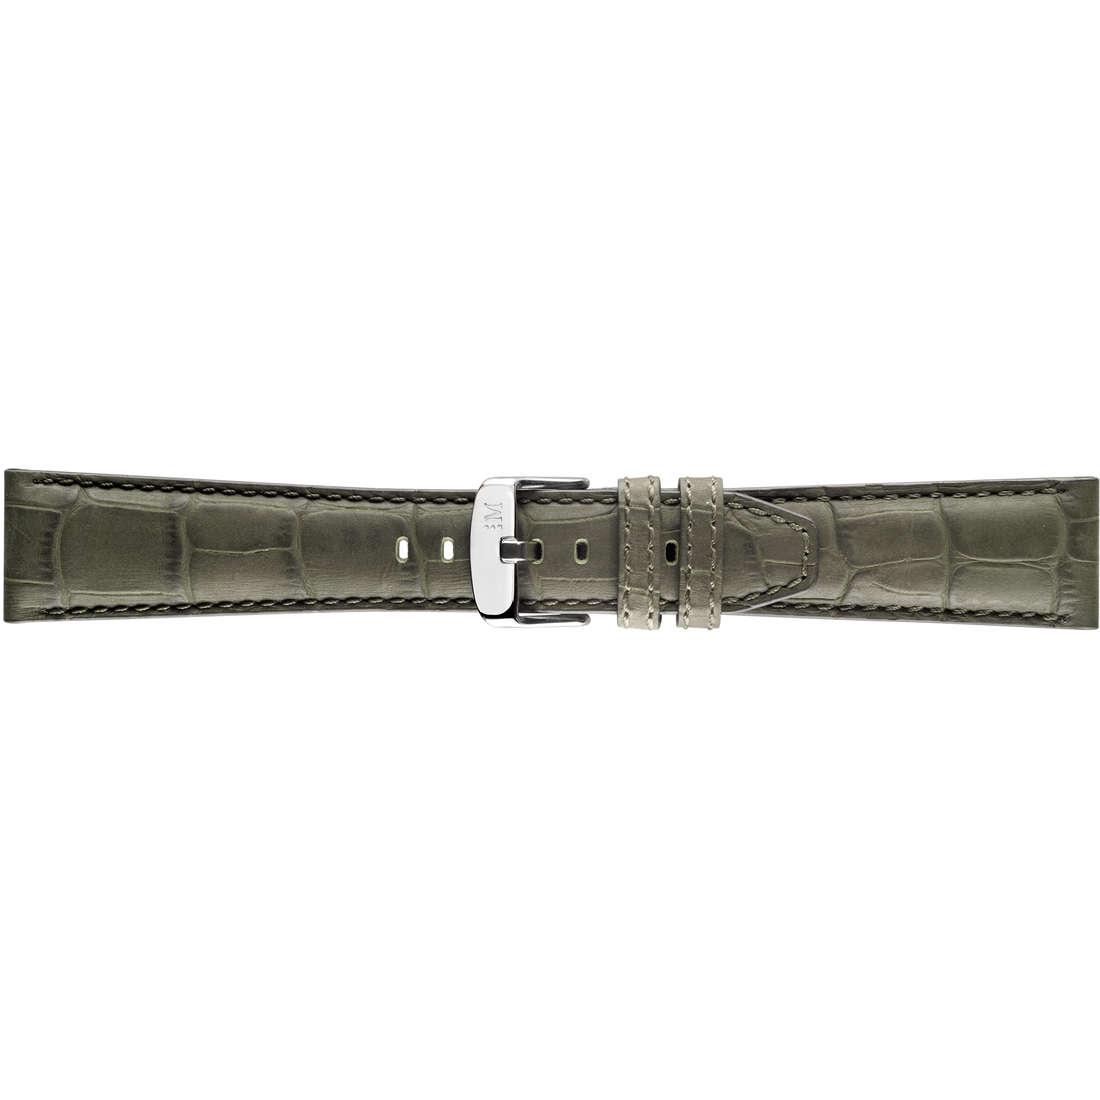 montre bande de montres homme Morellato Linea Sport A01X4497B44073CR22